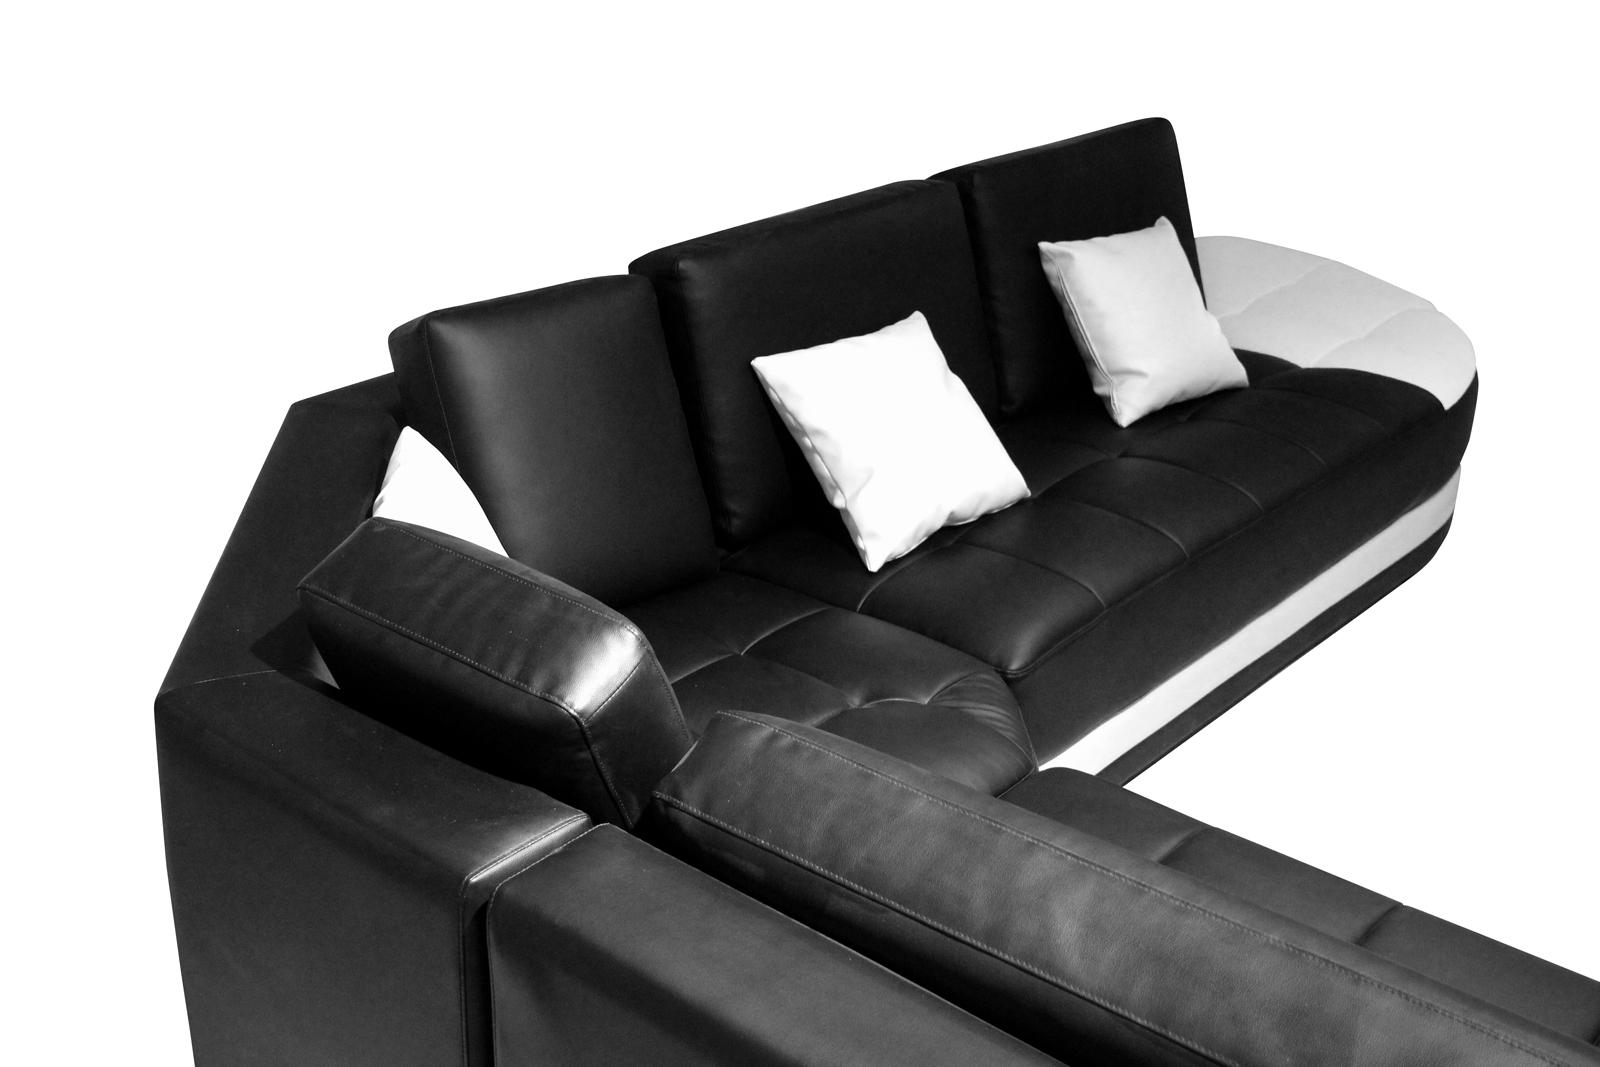 Sale Sofa Wohnlandschaft Ecksofa Schwarz Weiss Glorianna